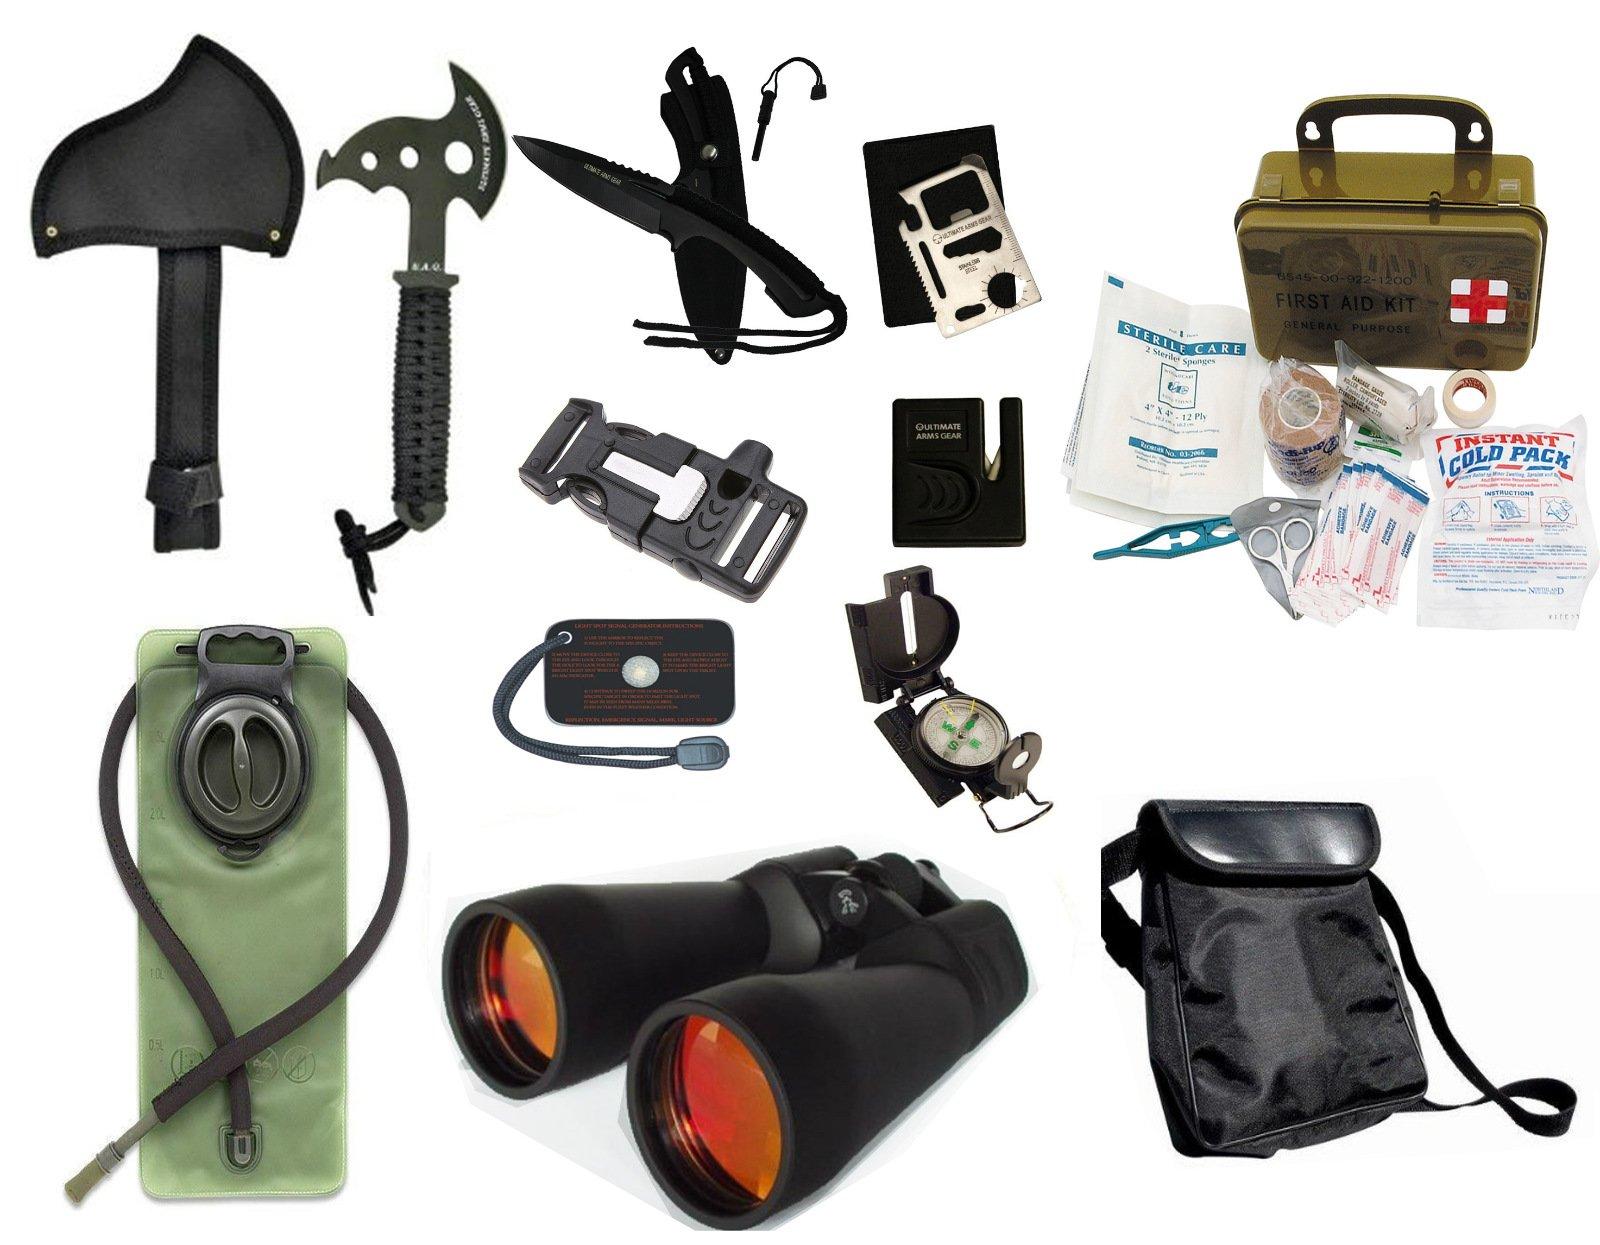 Survival Camping Hiking 20X70 Binoculars Ruby,Emergency First Aid Kit, Sharpener, Axe, Fire Starter Blade, Whistle Flint Striker Belt Buckle, Hydration Bladder, Multi Tool, Compass, Signal Mirror